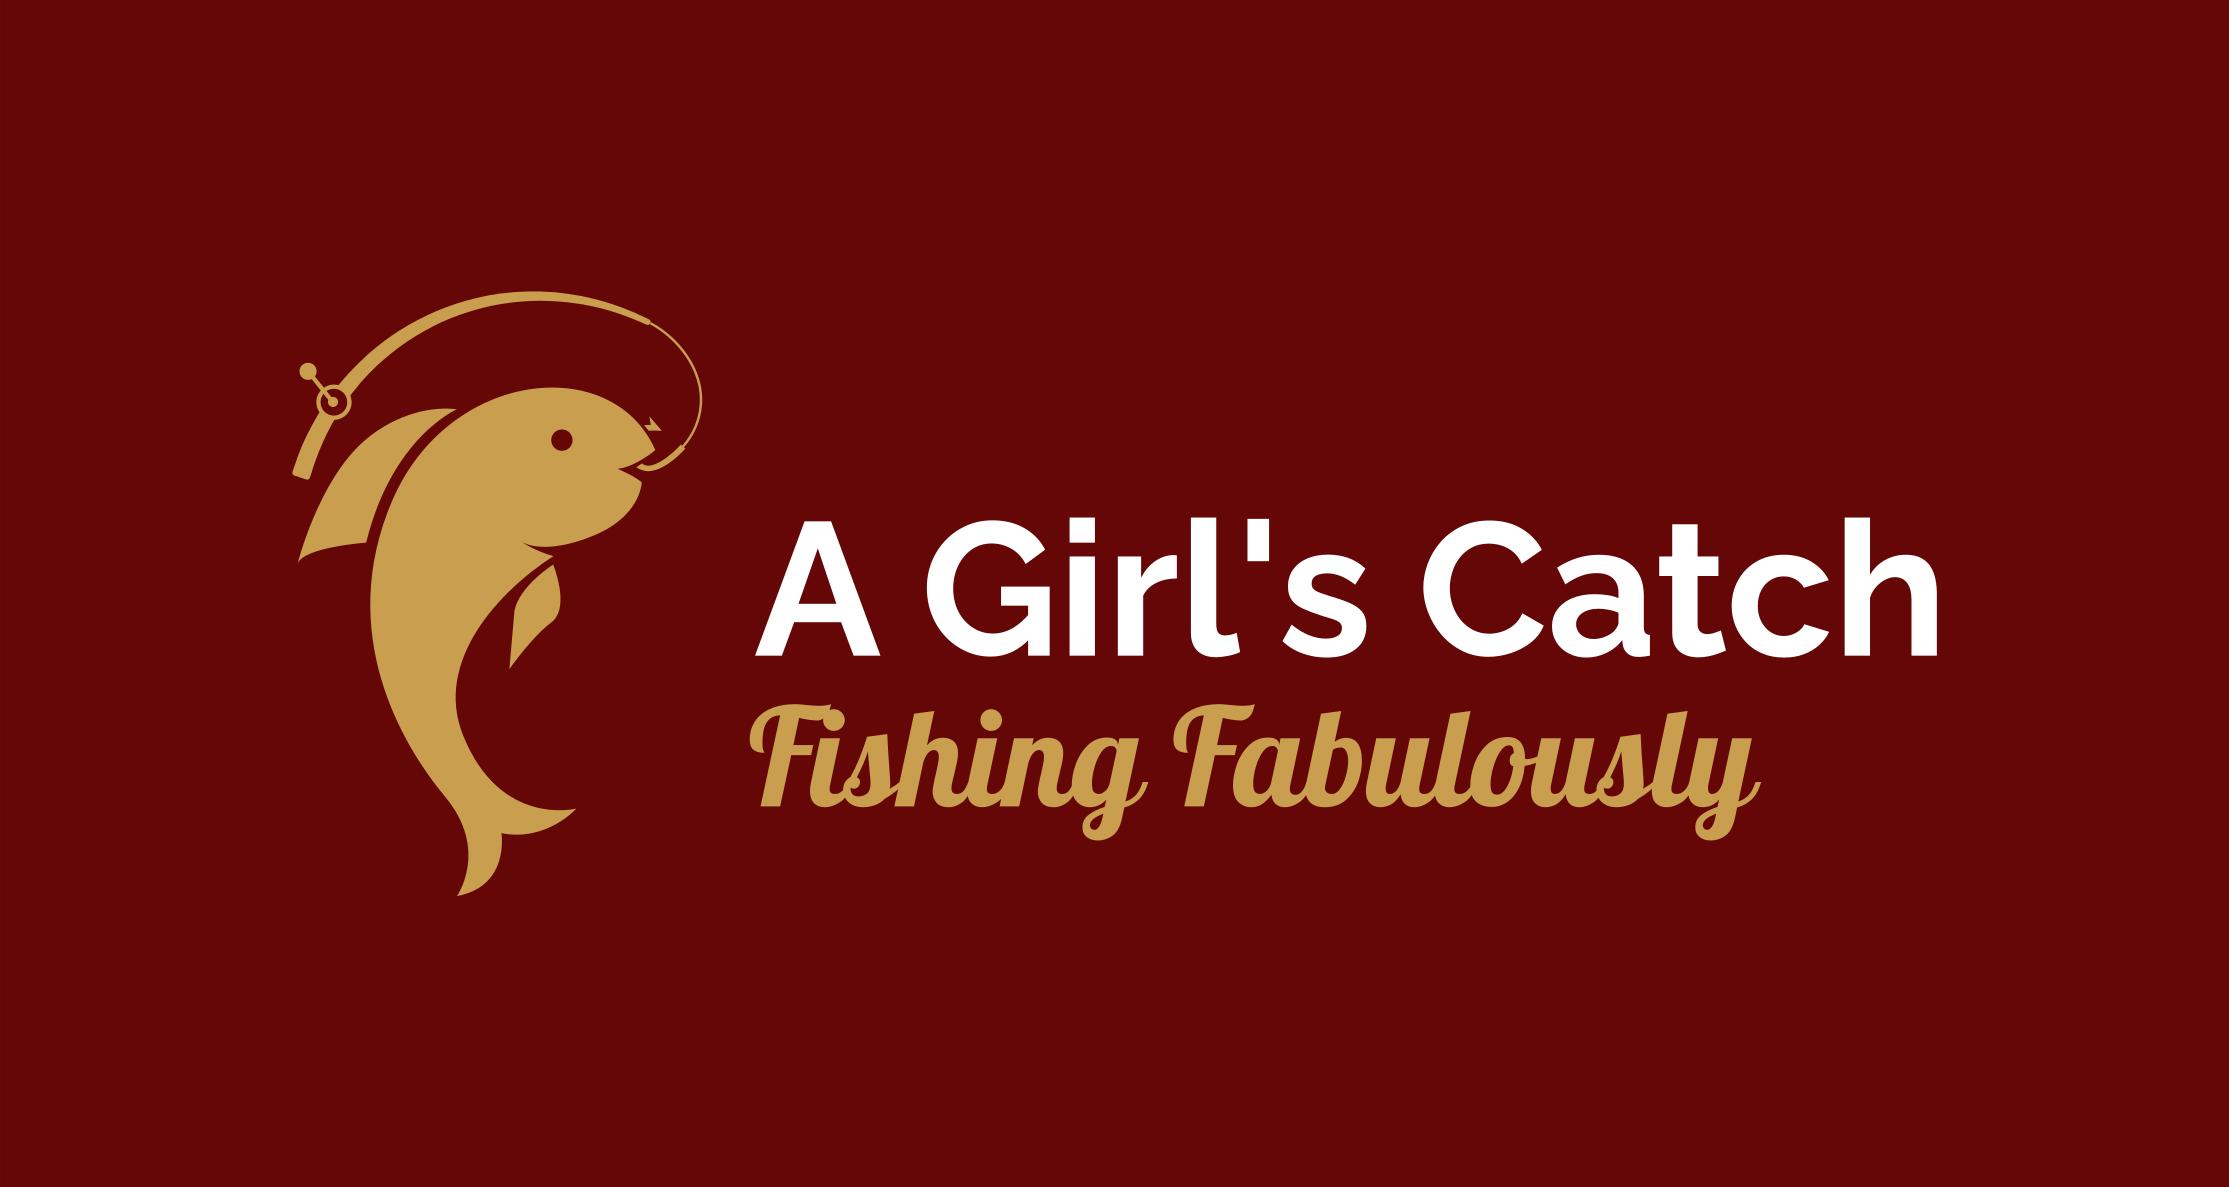 A Girl's Catch